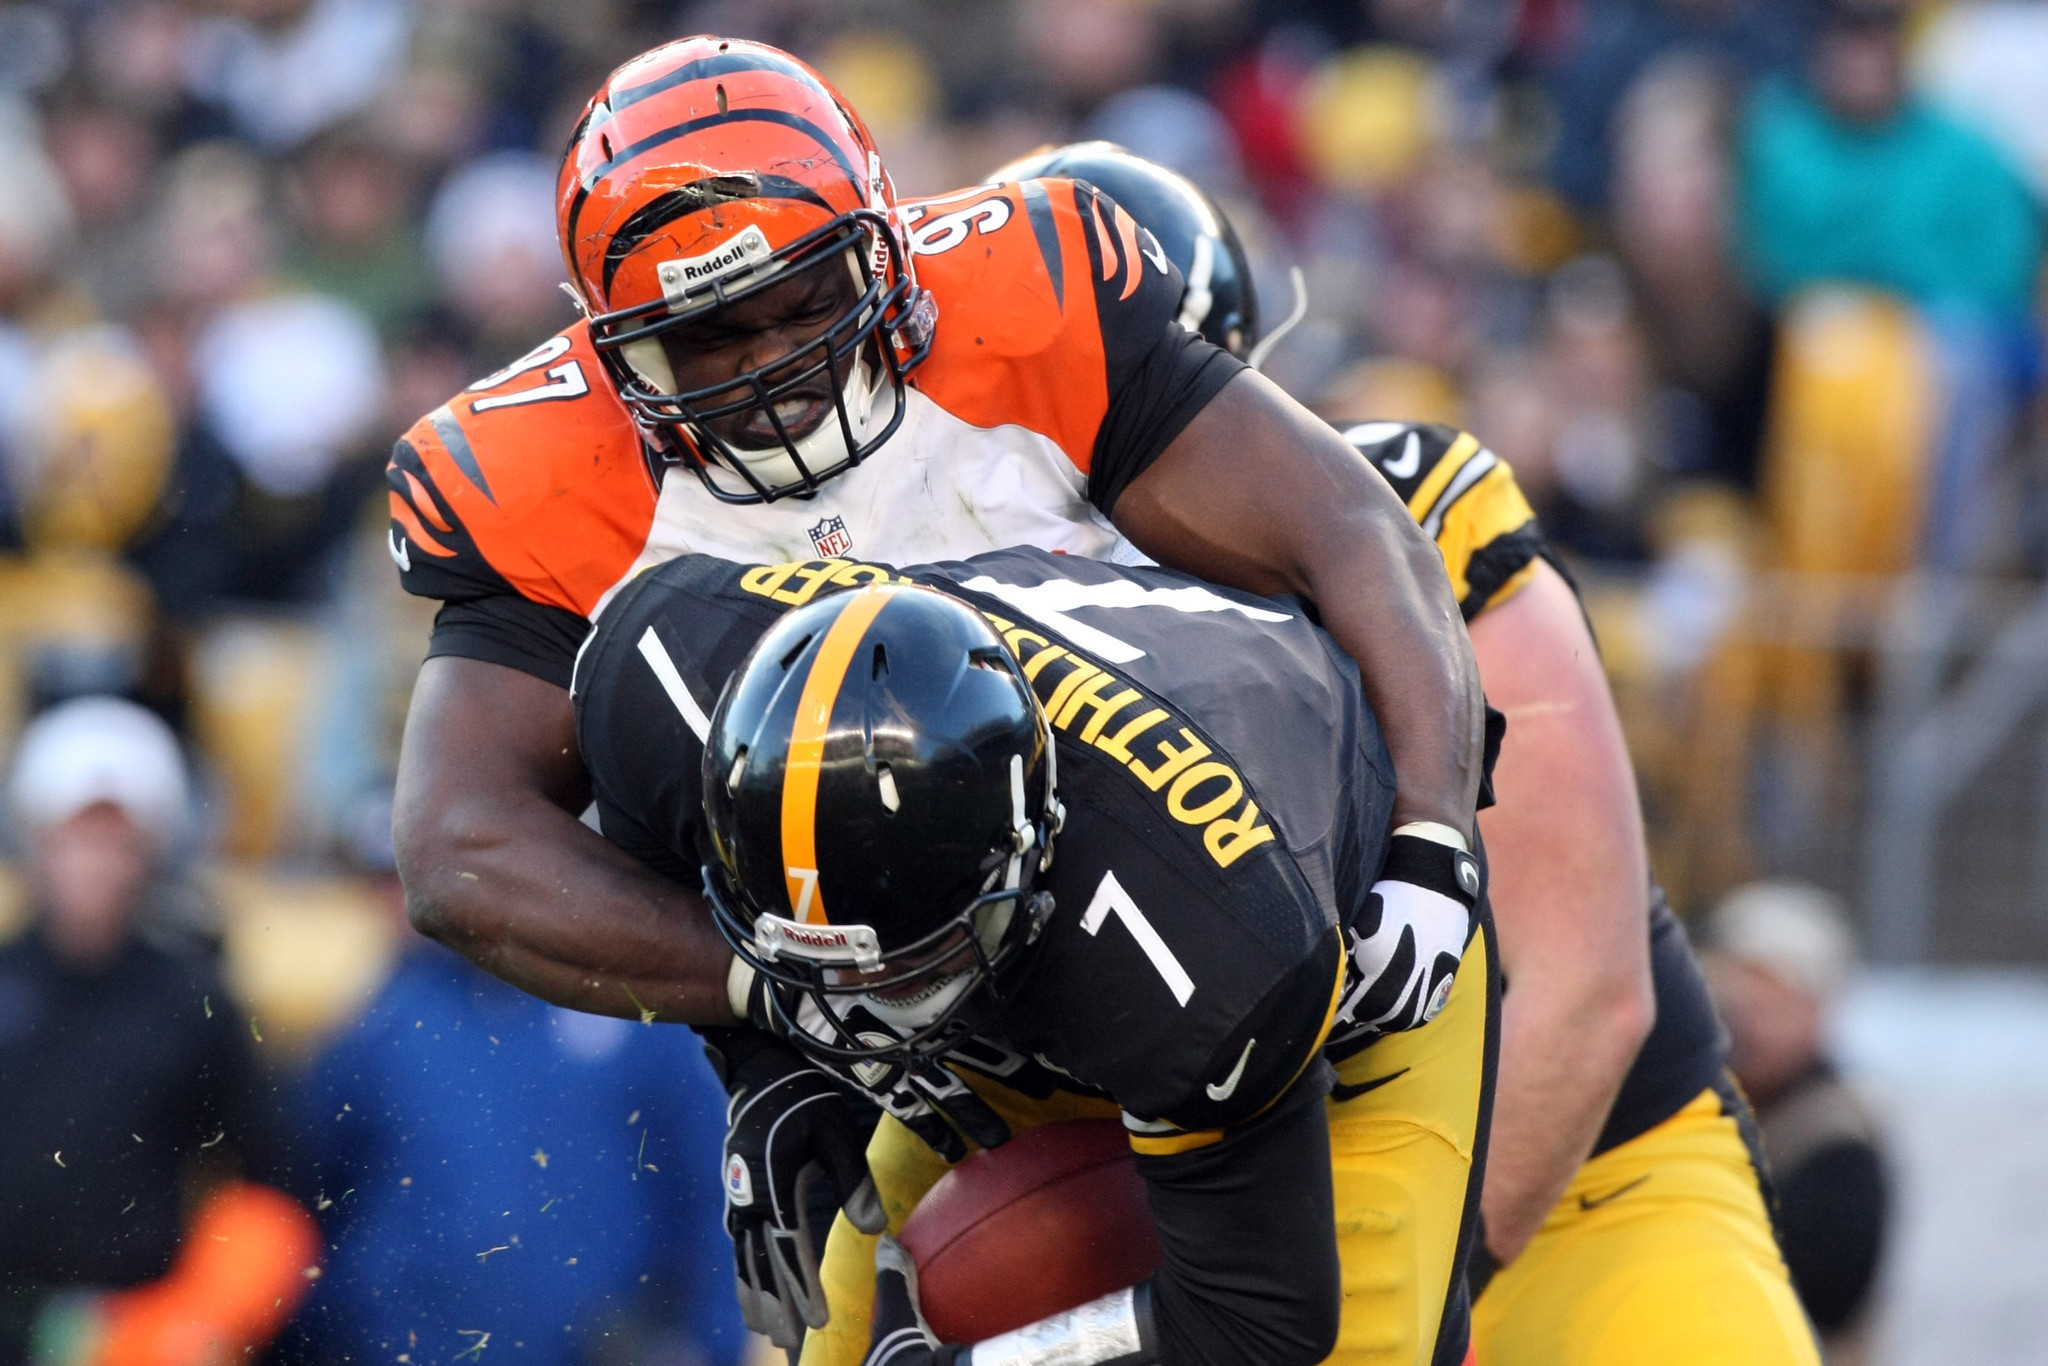 Defensive tackle Geno Atkins provides pressure for Bengals defense